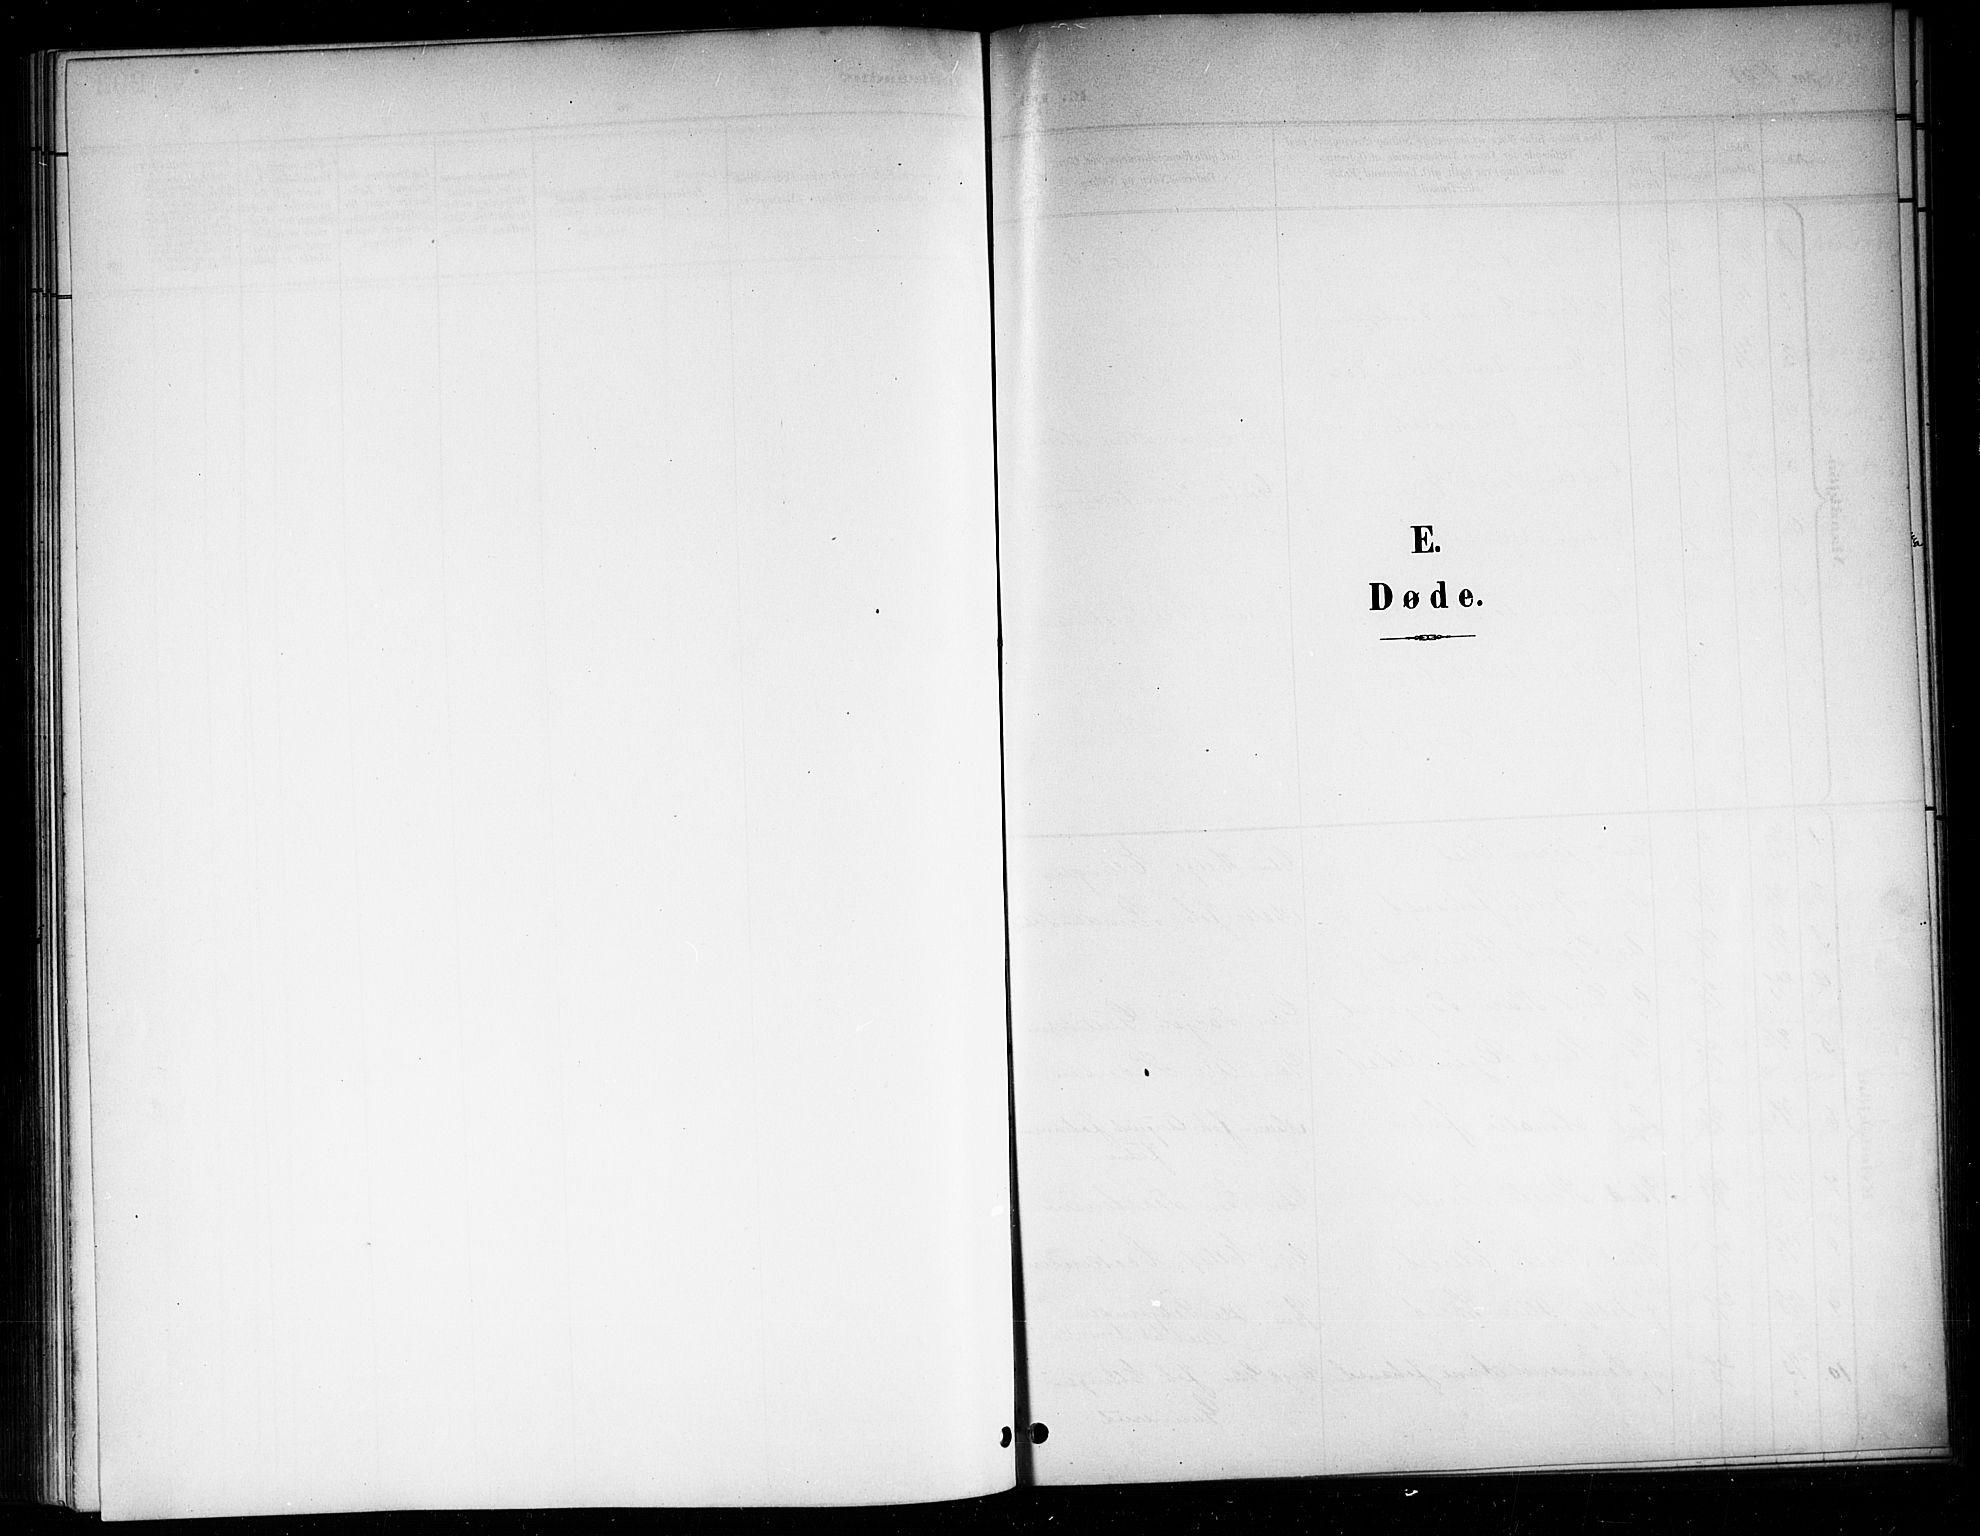 SAKO, Sigdal kirkebøker, G/Ga/L0006: Klokkerbok nr. I 6, 1901-1916